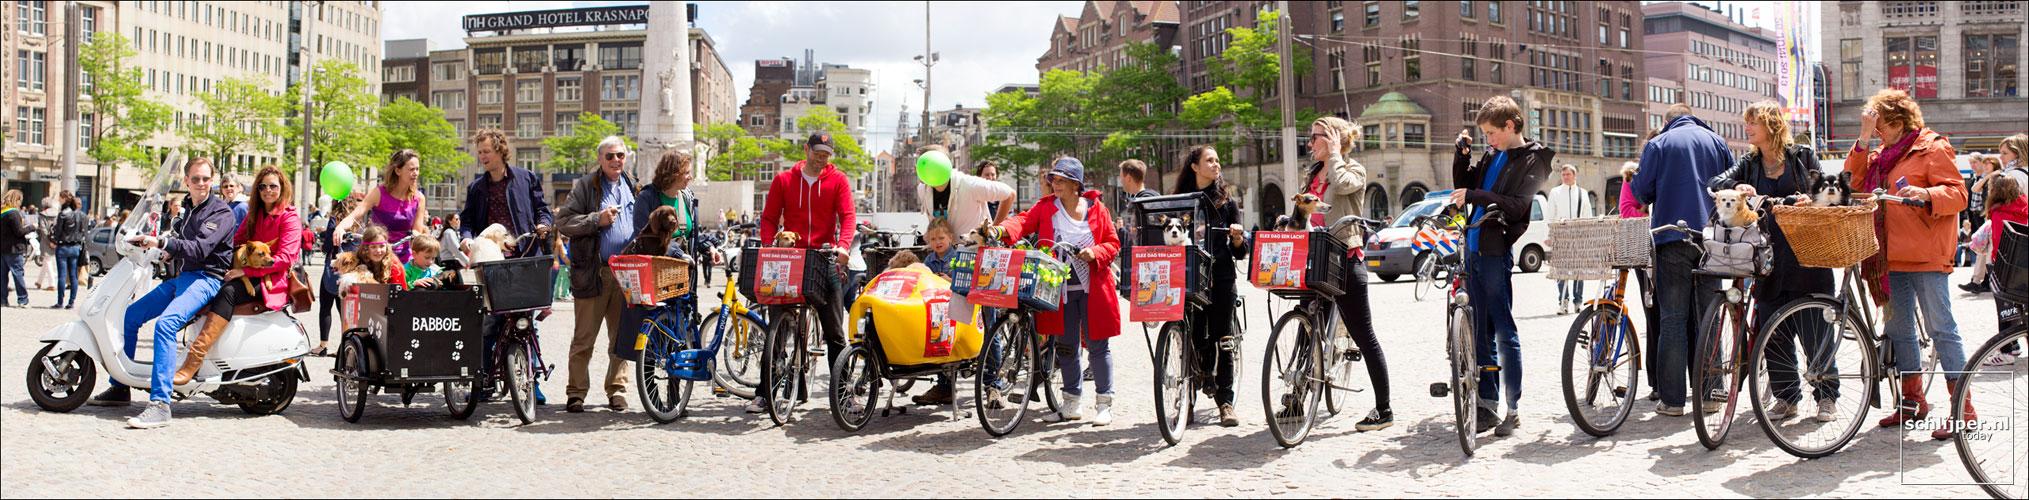 Nederland, Amsterdam, 23 juni 2013